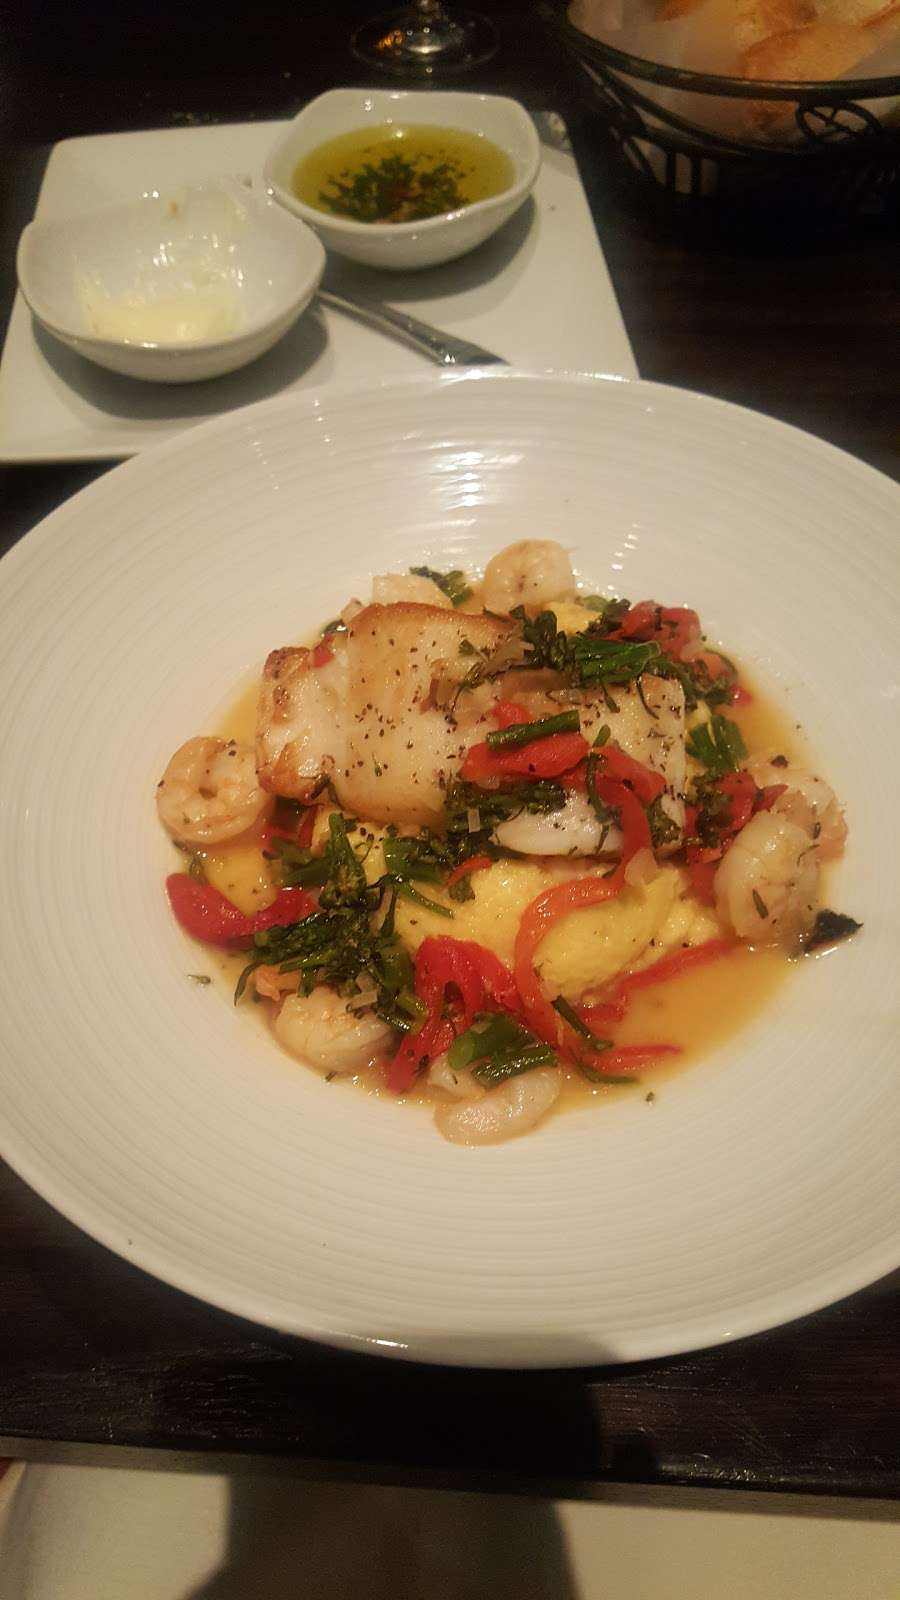 Pancetta - restaurant  | Photo 8 of 10 | Address: 100 Frank W Burr Blvd, Teaneck, NJ 07666, USA | Phone: (201) 928-2009